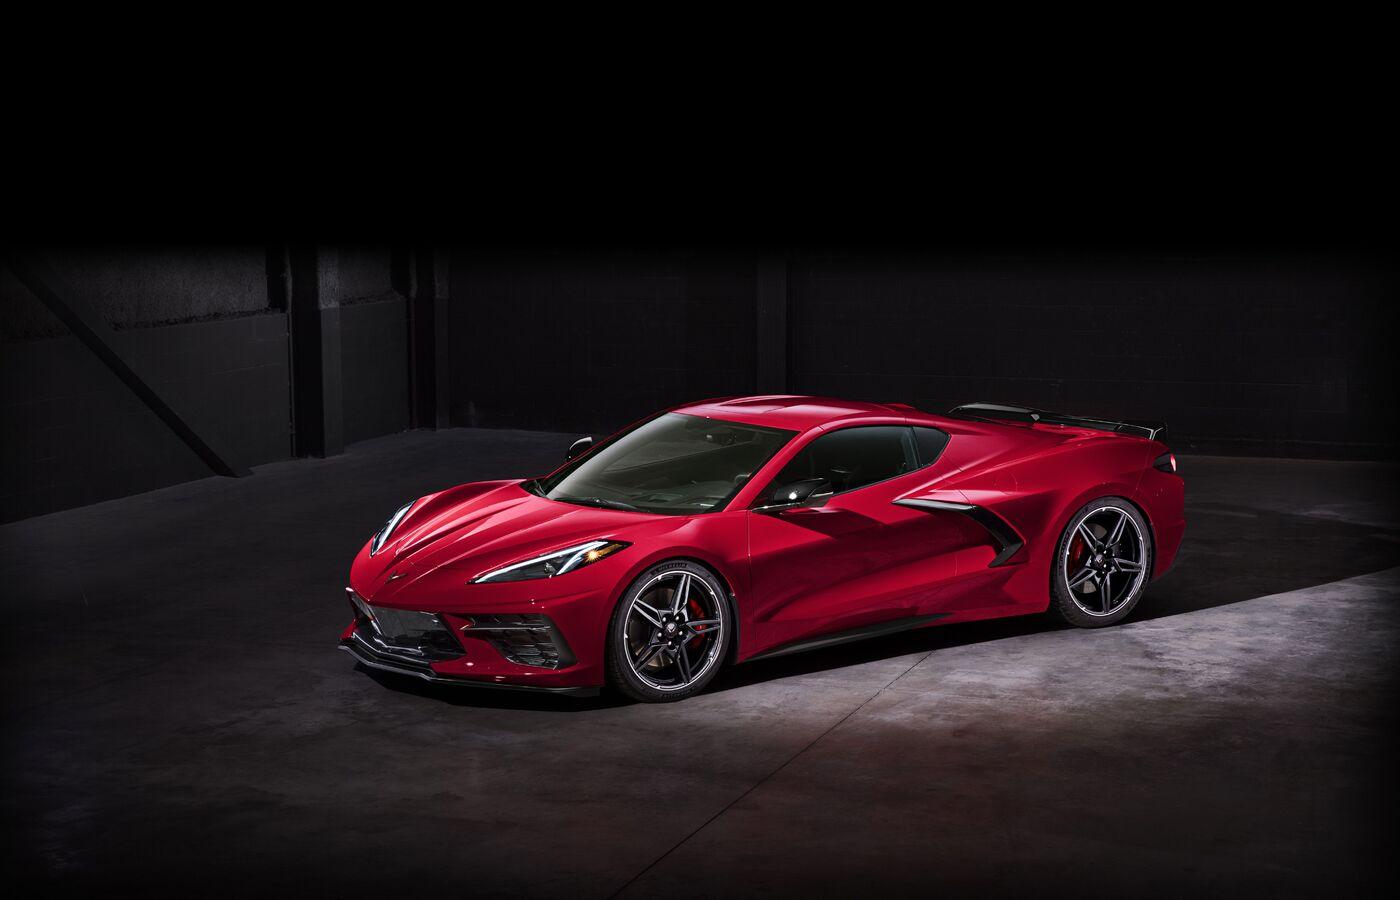 2020-chevrolet-corvette-stingray-c8-y1.jpg